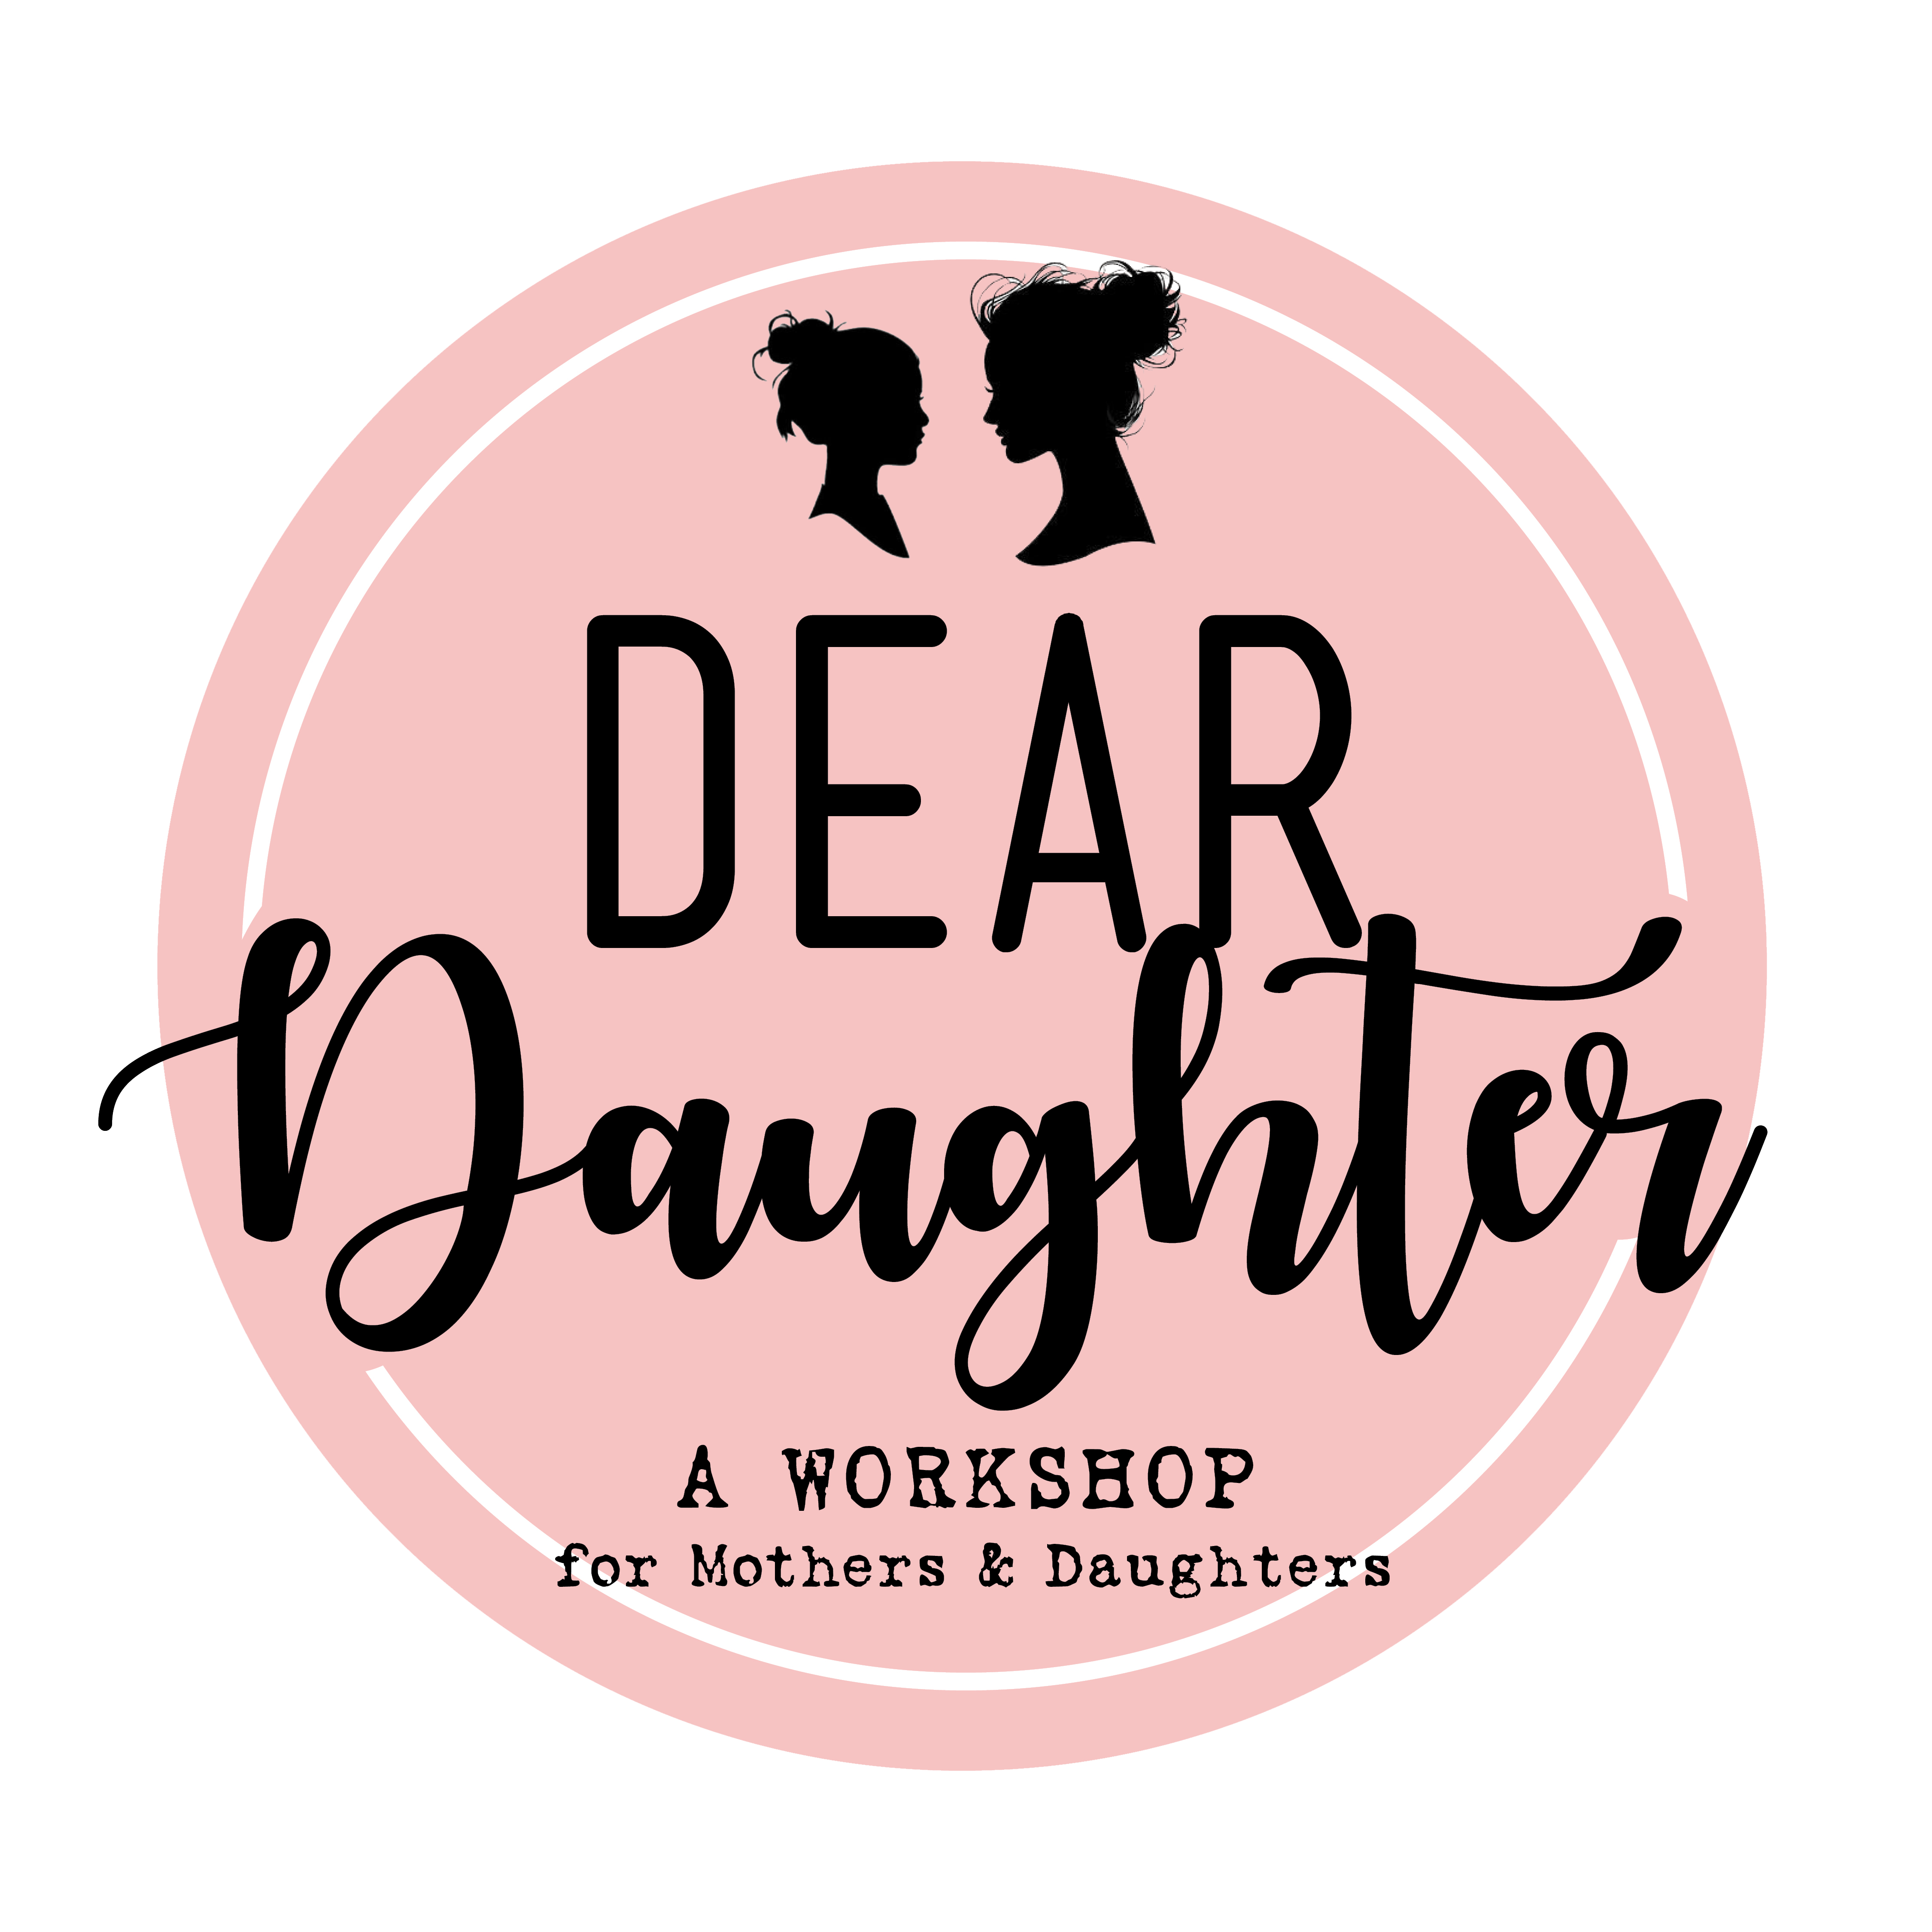 Dear_Daughter_LOGO